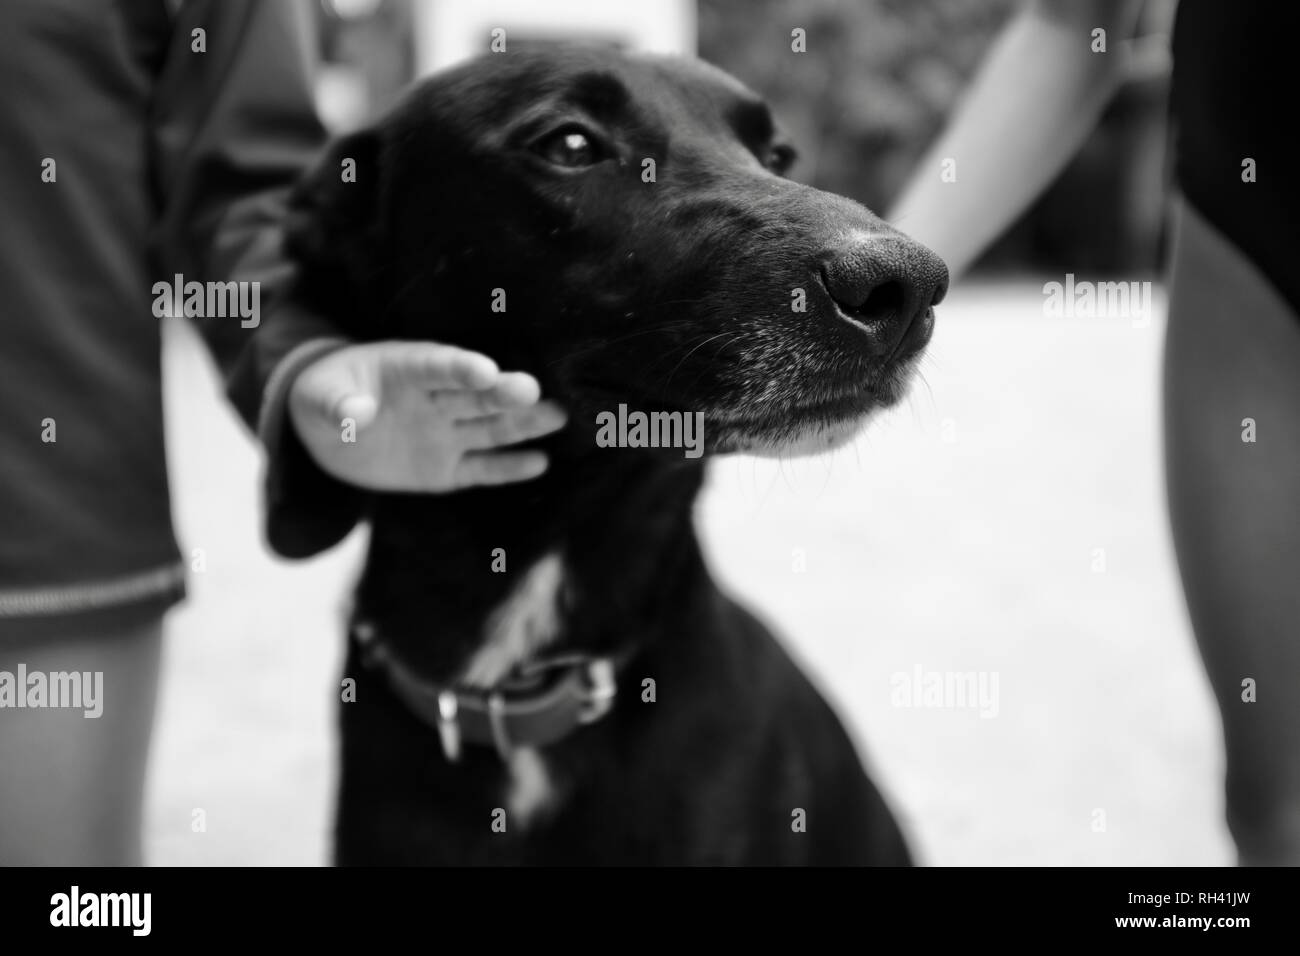 Portrait of a friendly black dog being petted by children, Finch Hatton, Queensland 4756, Australia Stock Photo